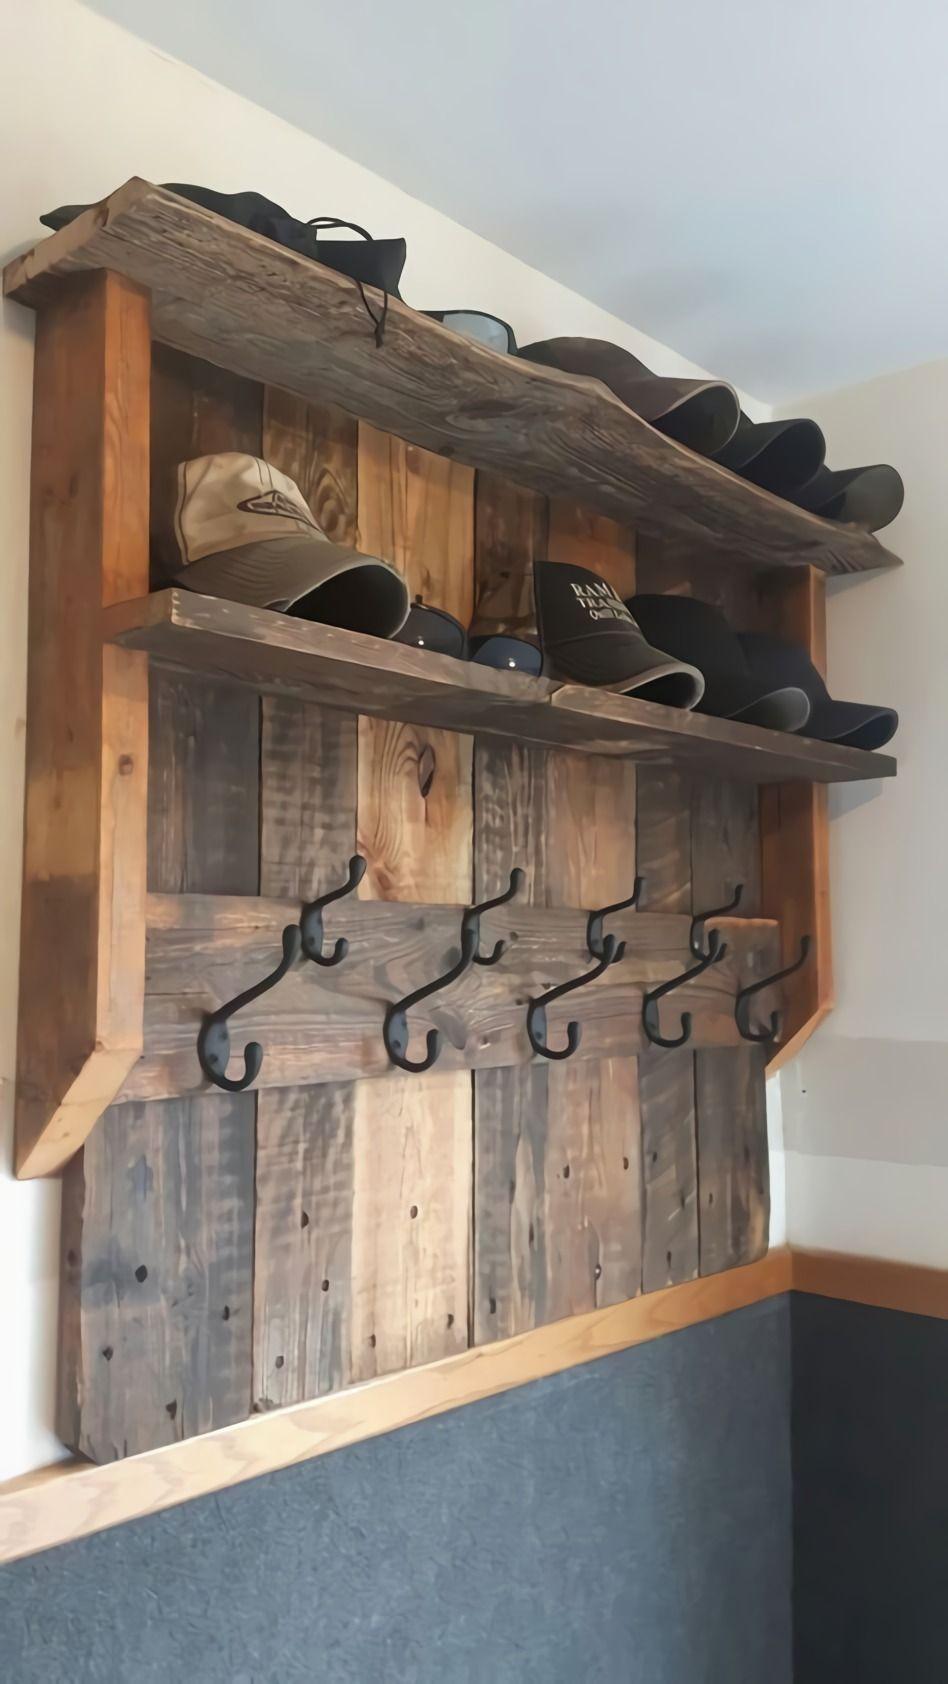 9 DIY Hat Rack Ideas for Any Home Diy pallet furniture